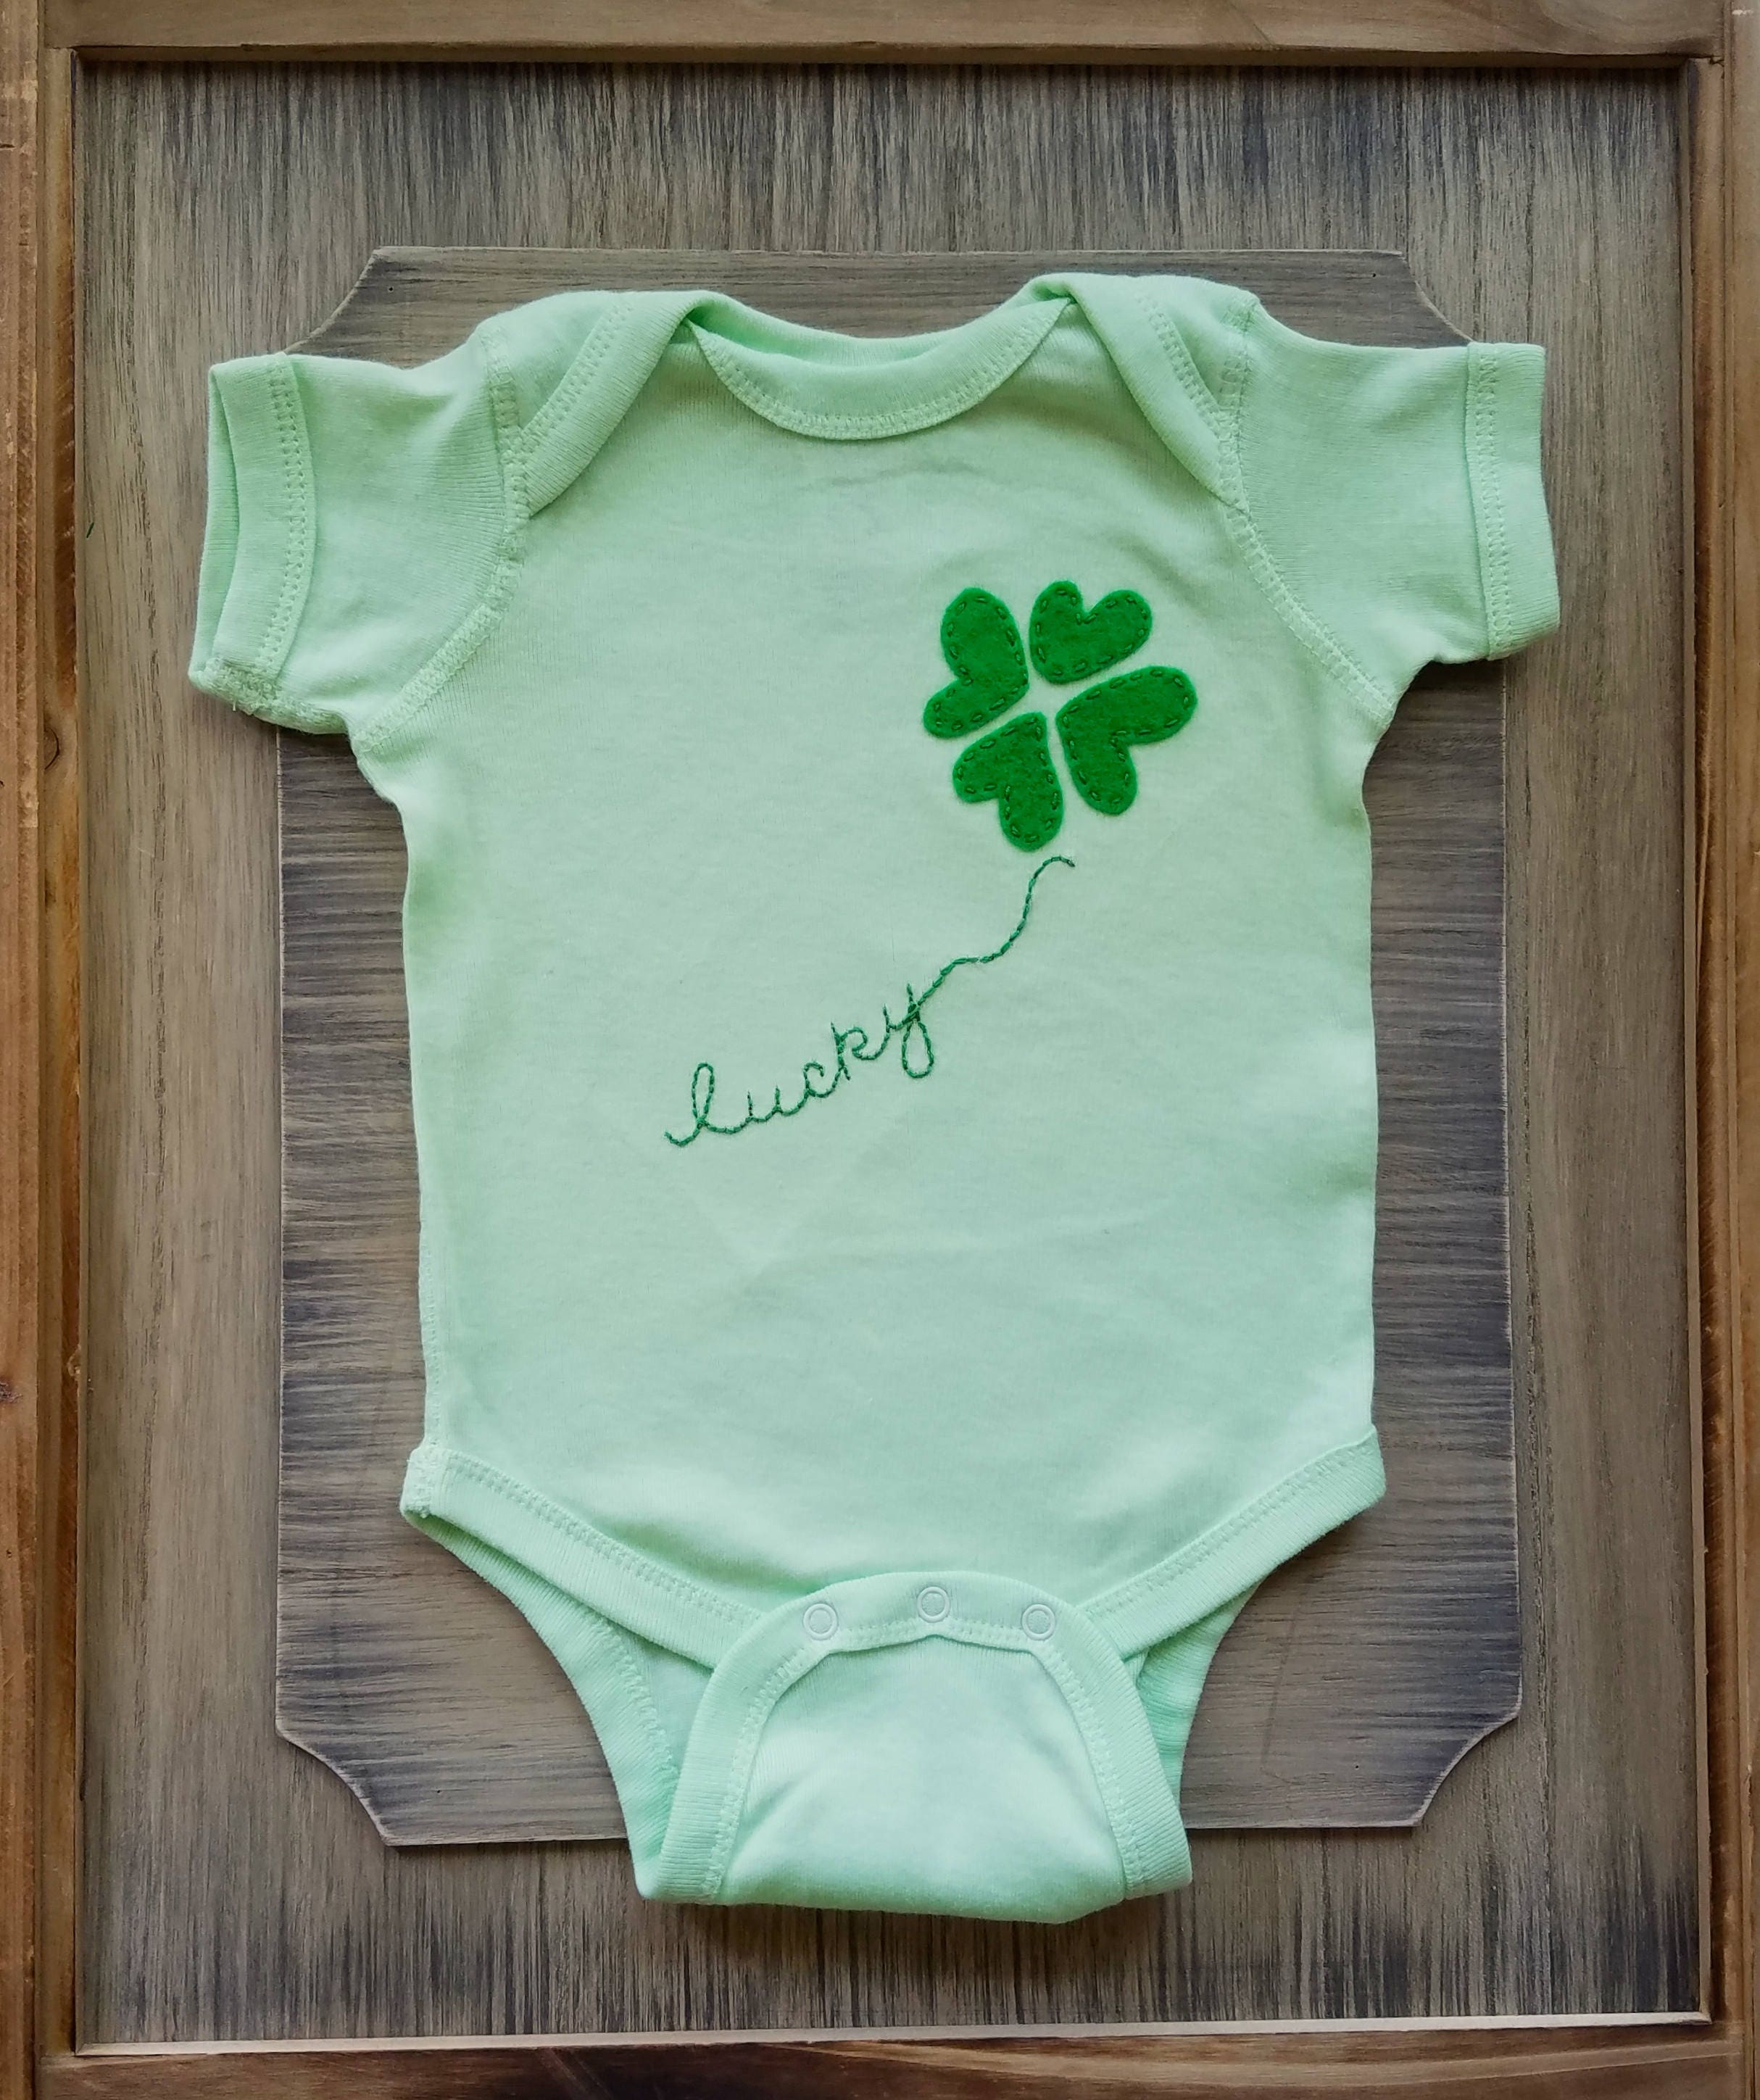 Newborn St Patricks Day Saint Patricks Day Baby Luck of the